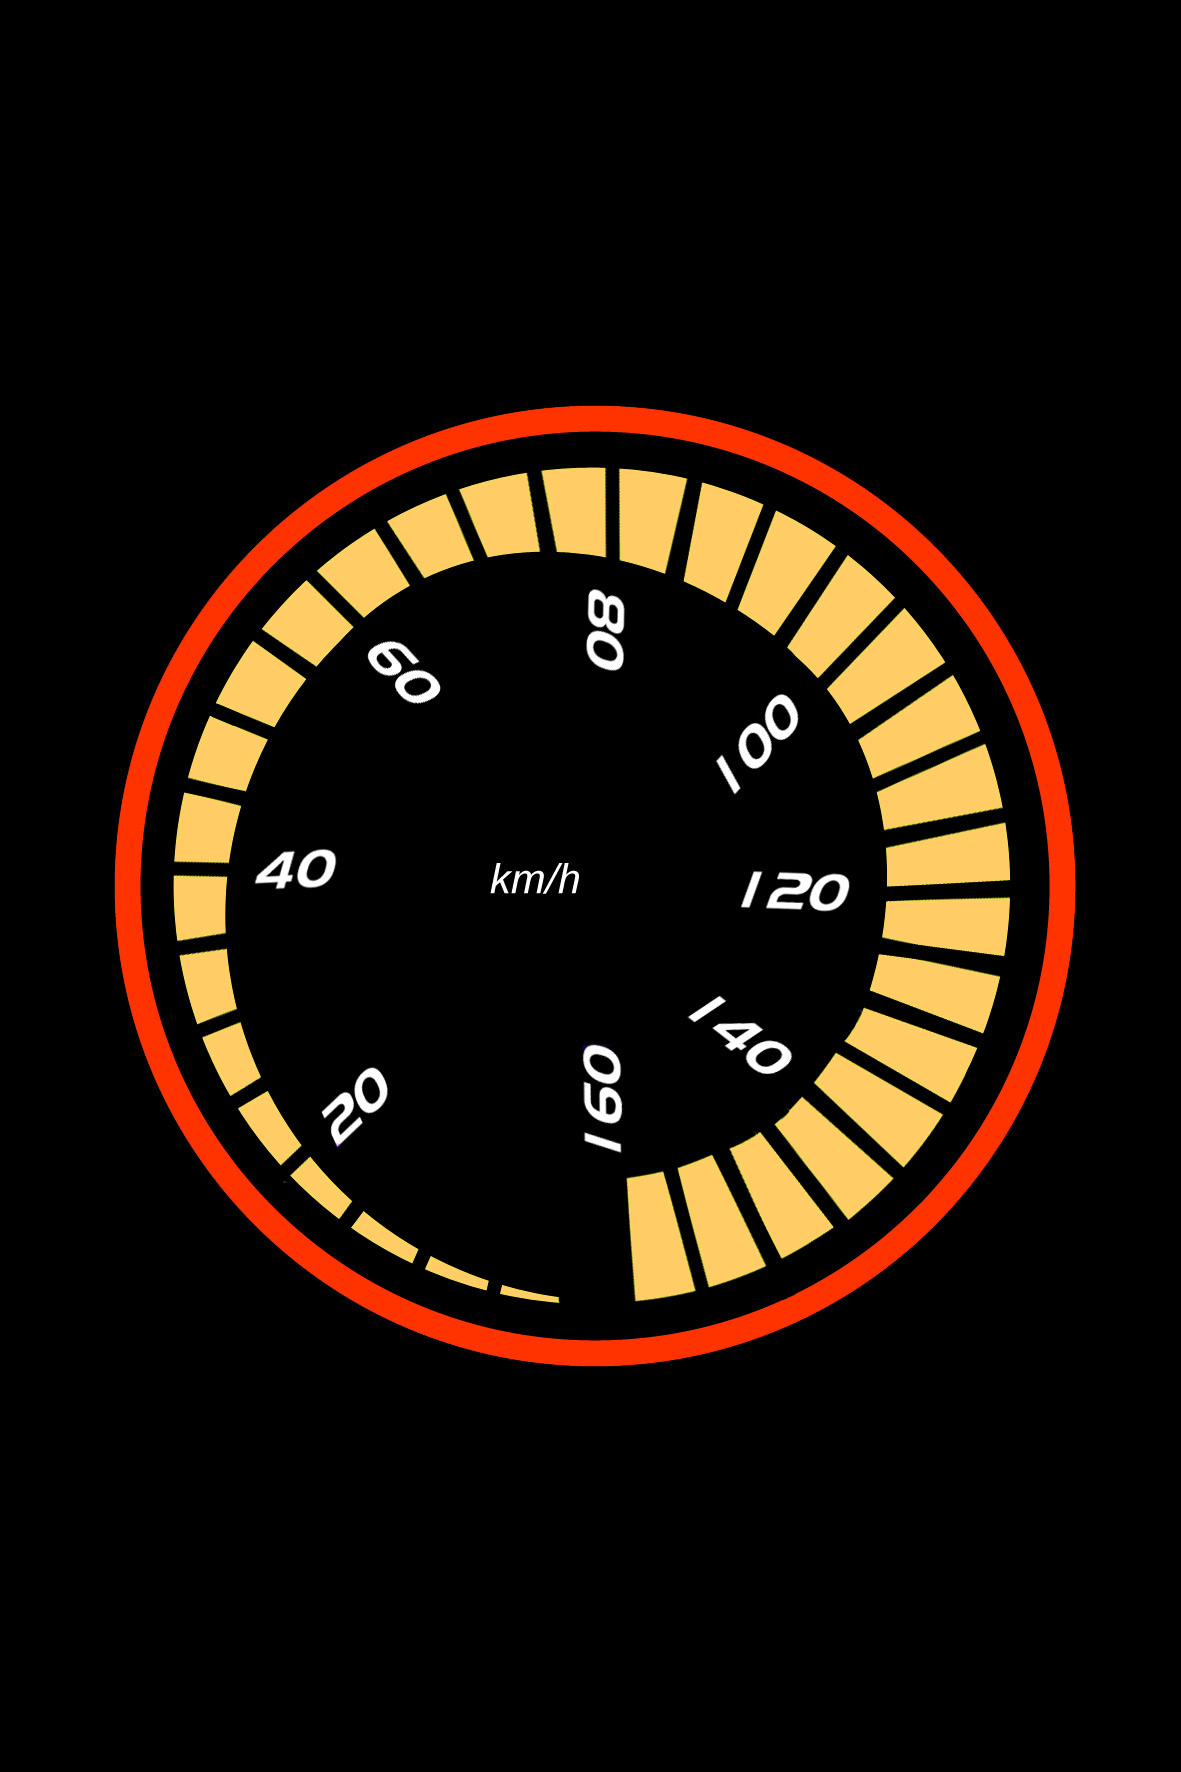 With Wiring Diagram Sdometer On Alfa Romeo Sdometer Wiring Diagram